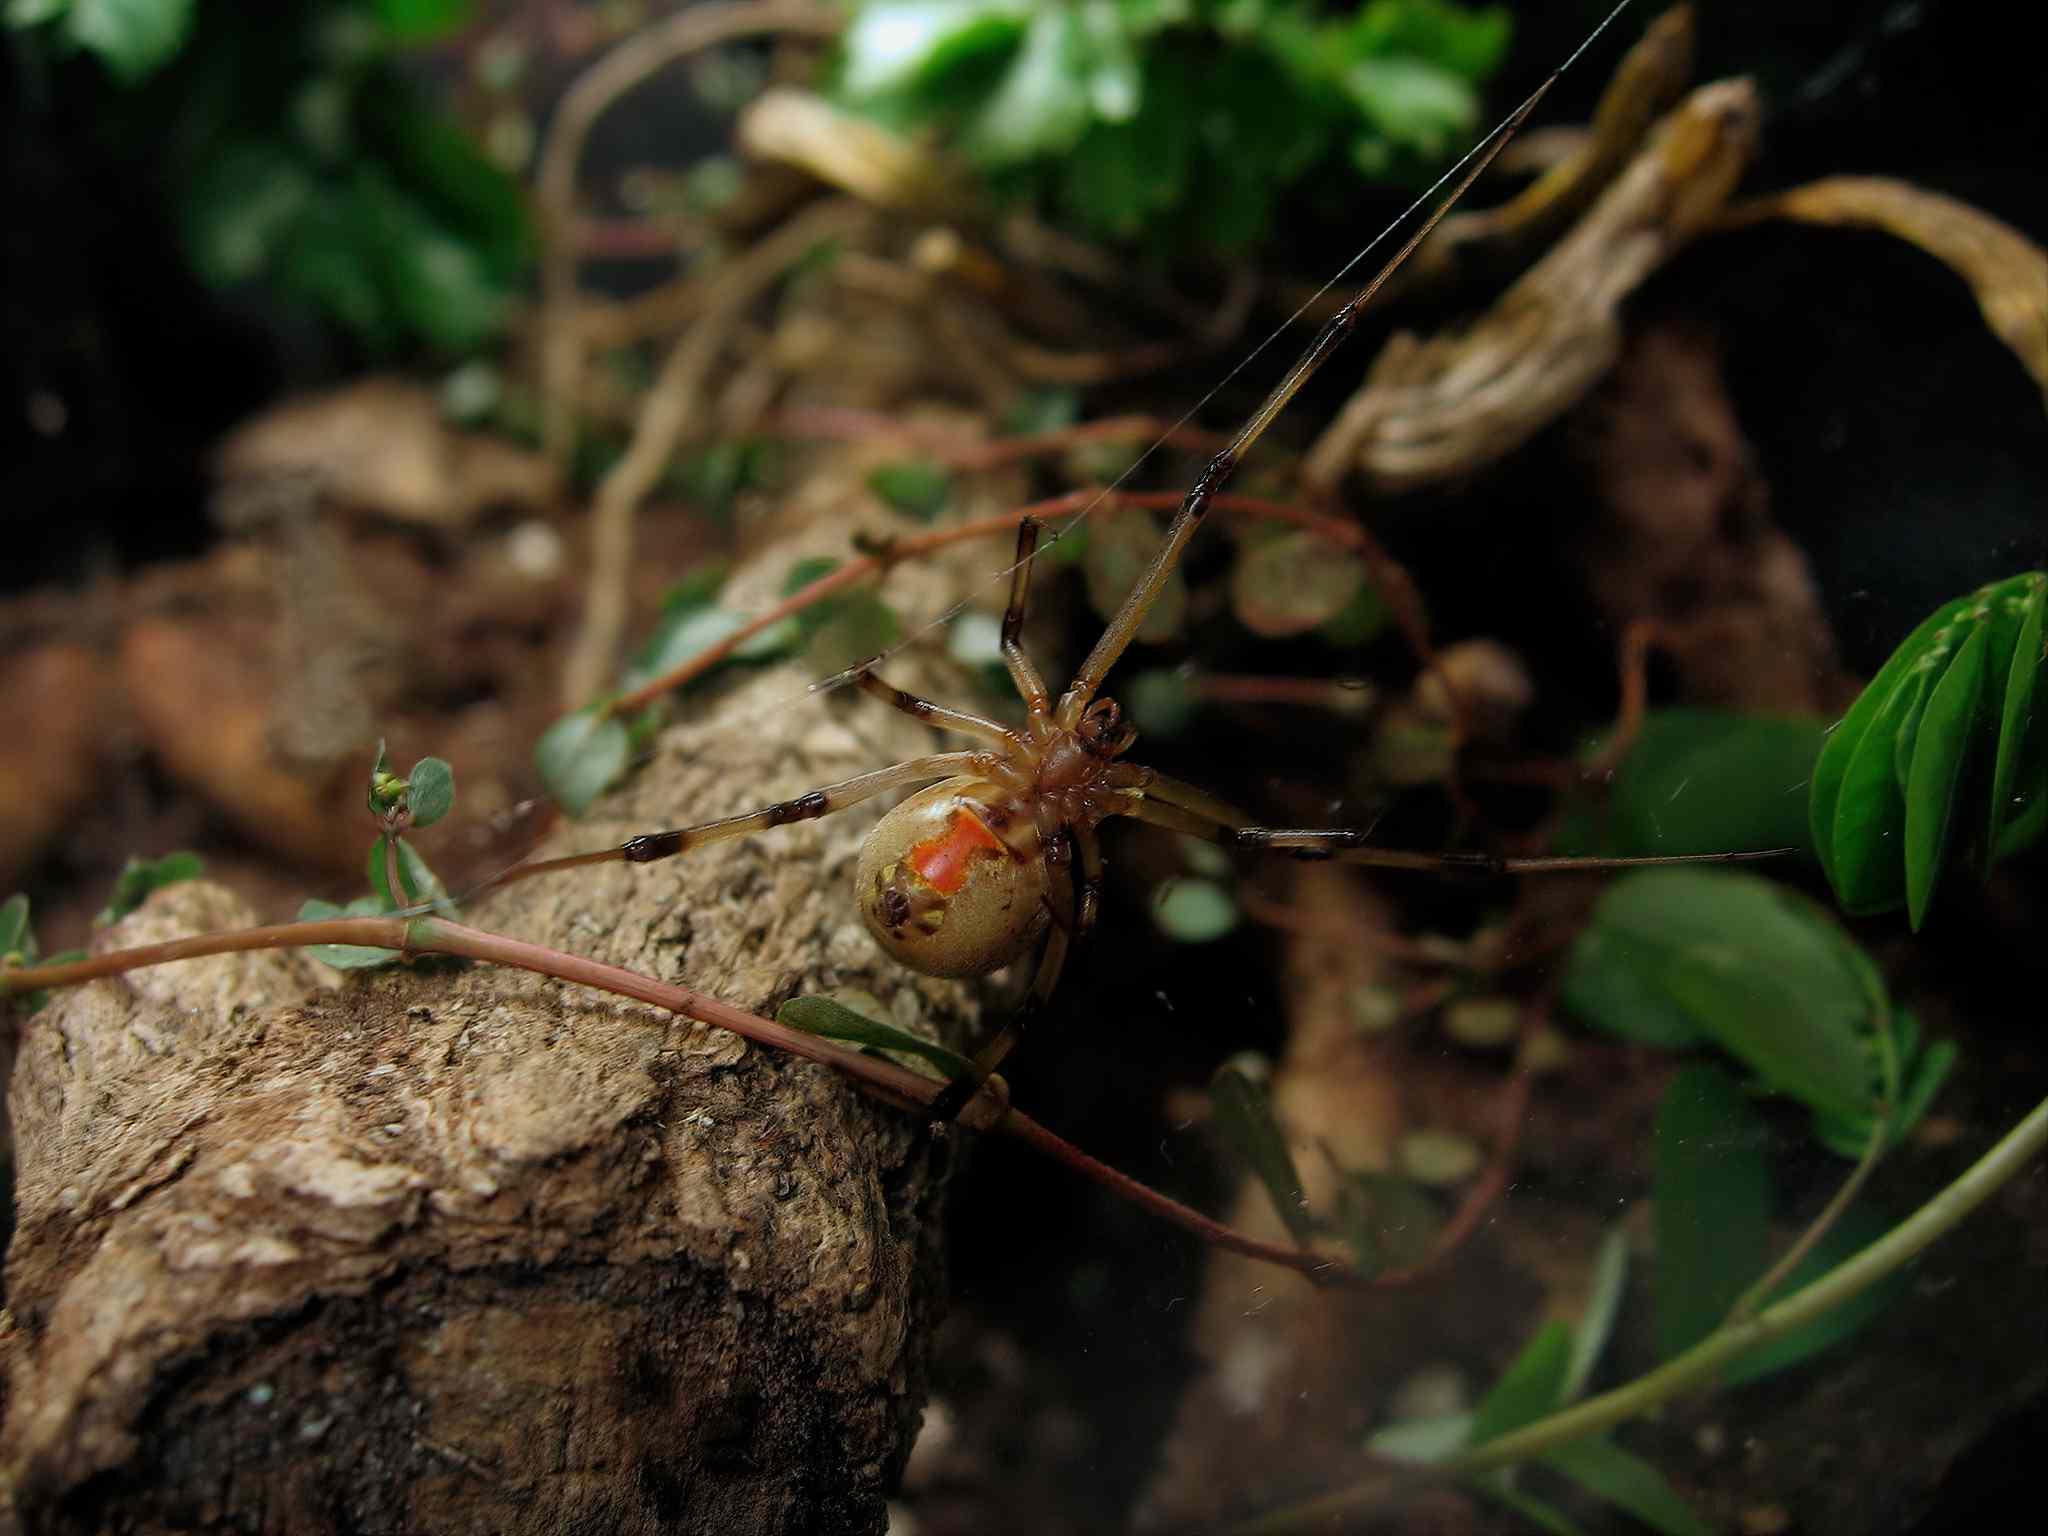 brown widow spider, Latrodectus geometricus, in web